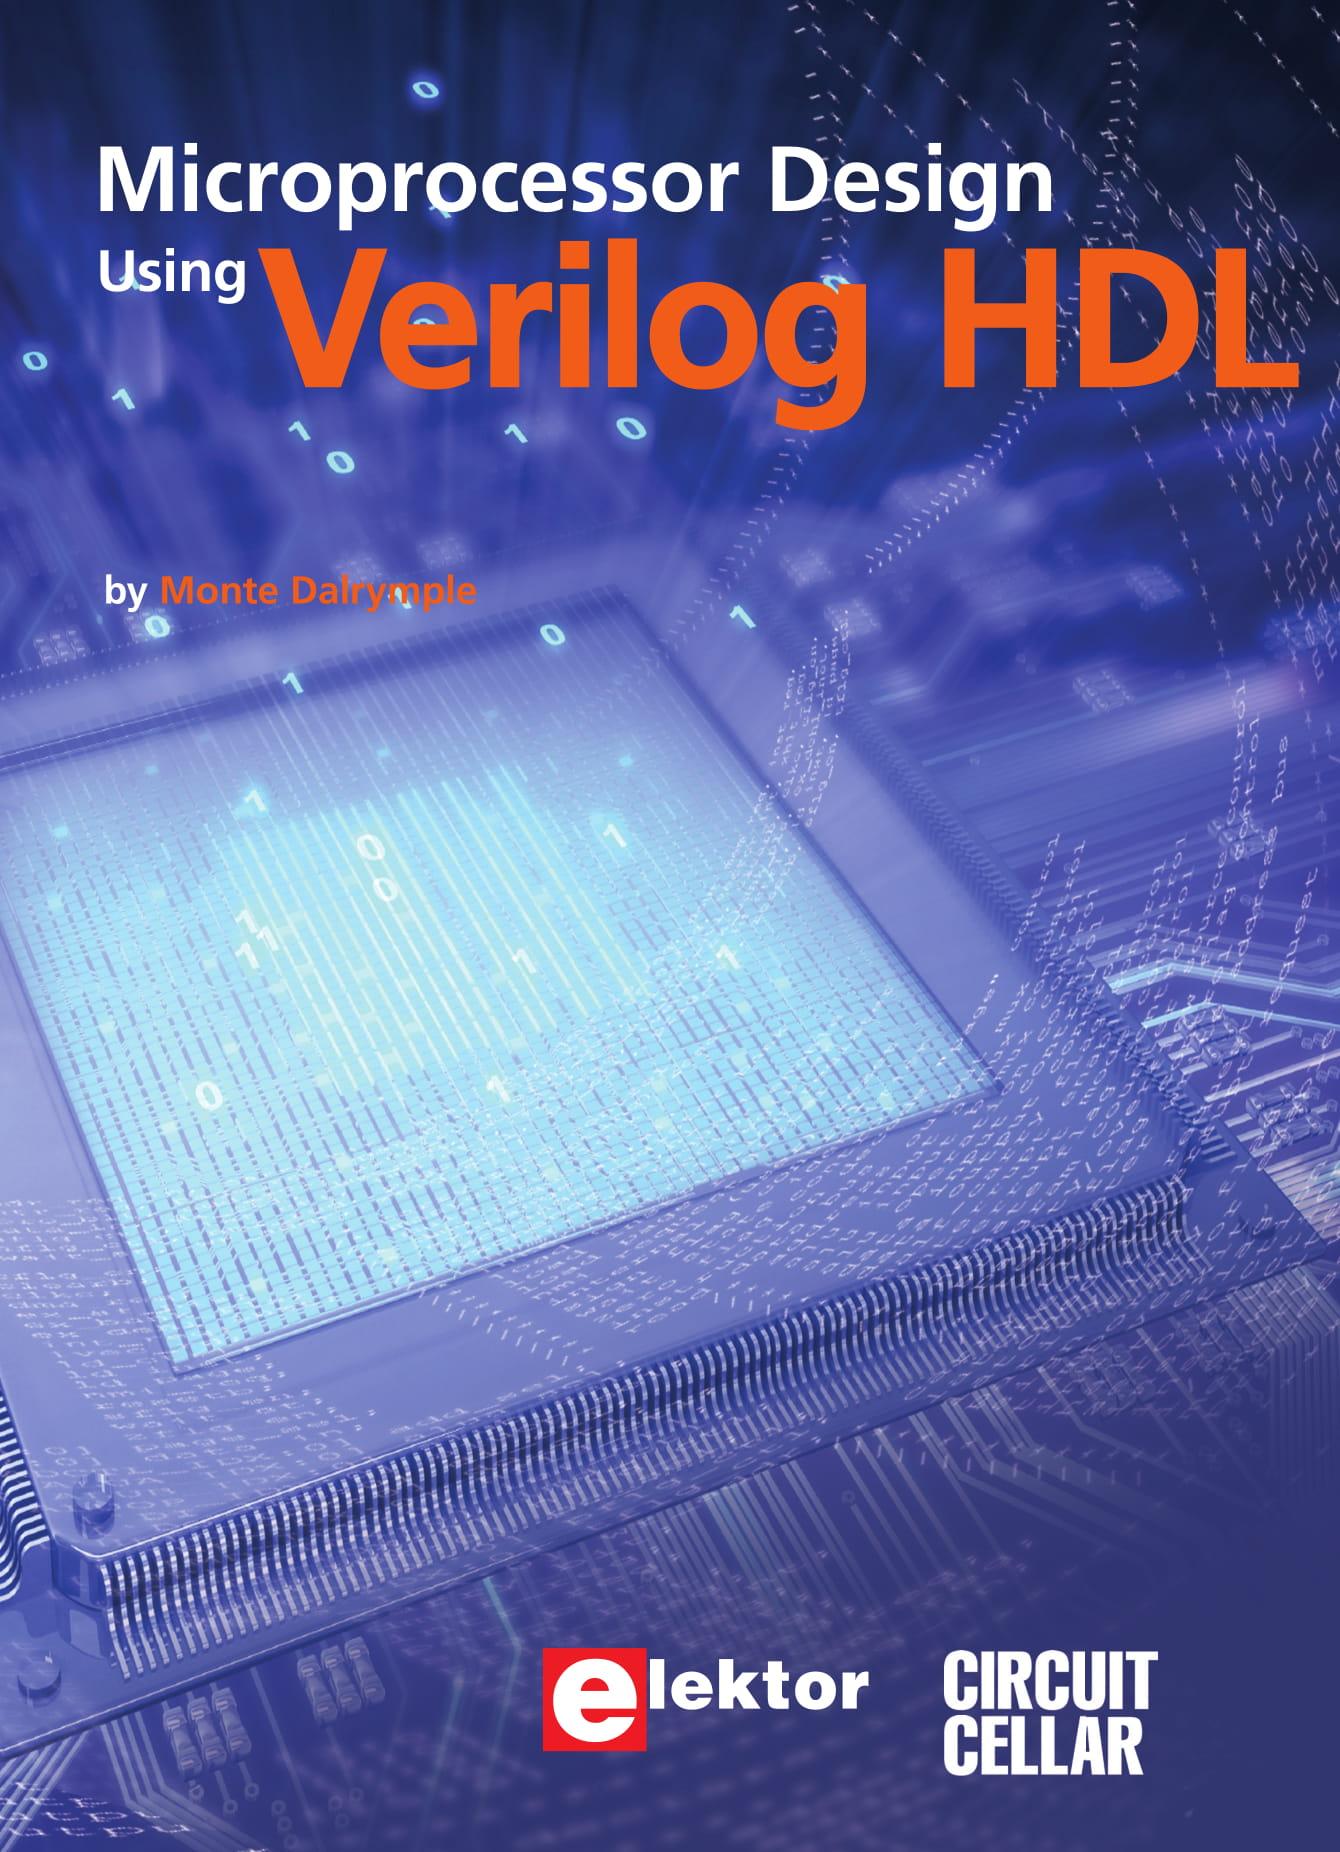 Microprocessor Design Using Verilog HDL (E-book)